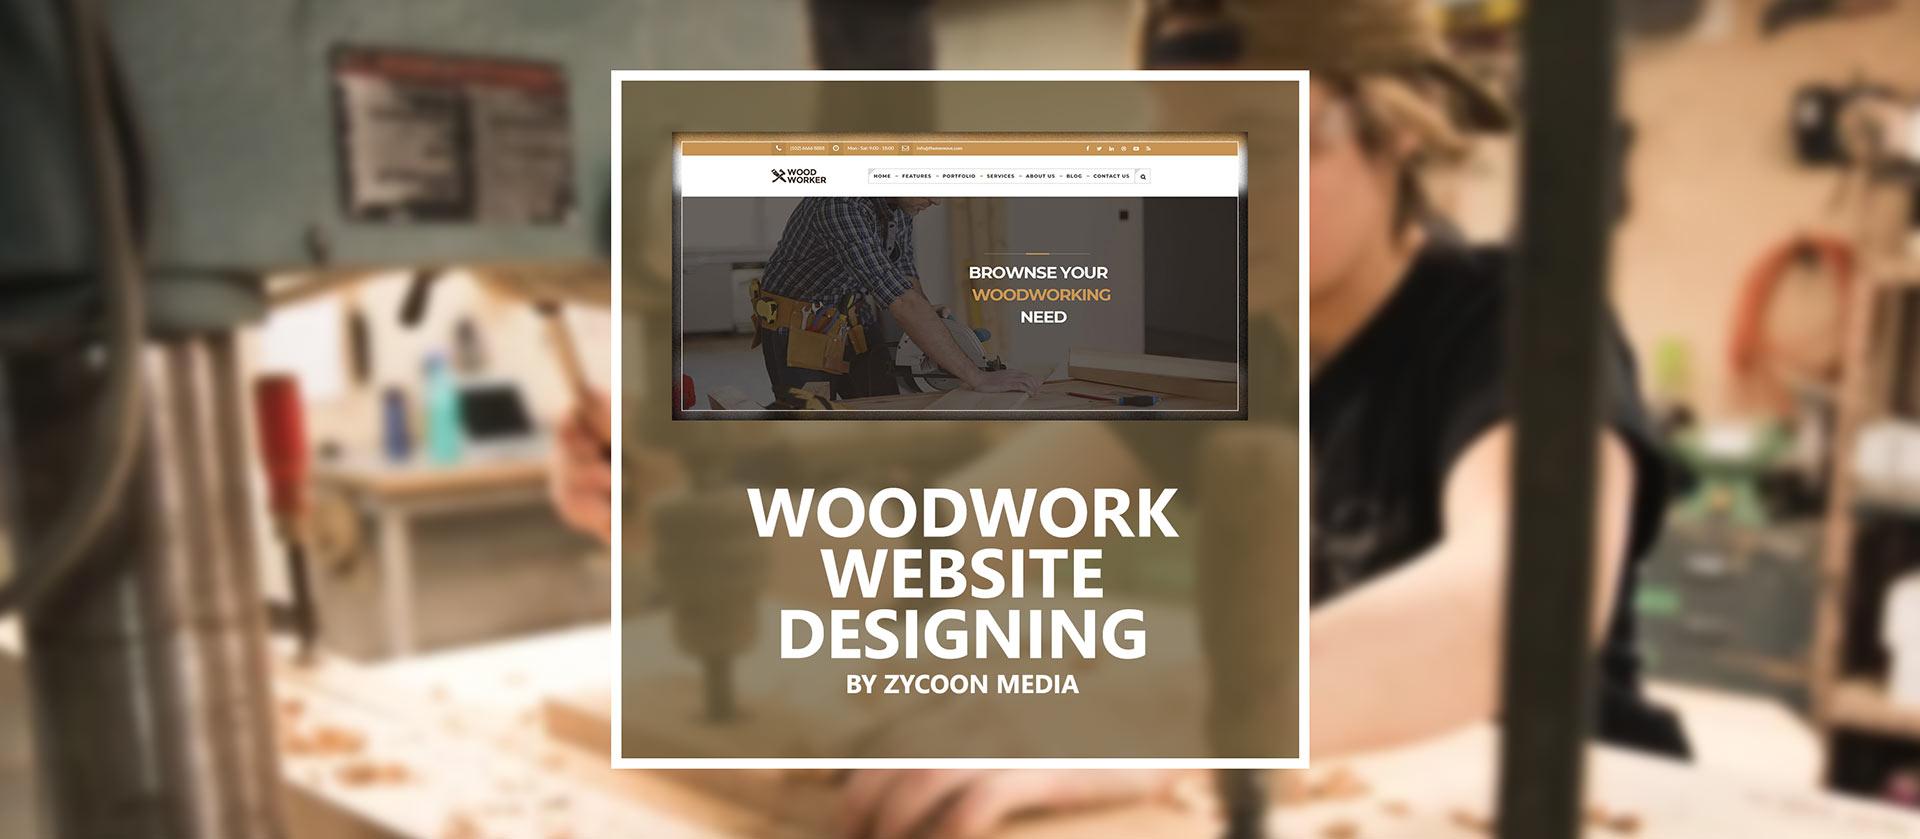 Woodwork Website Design Seo